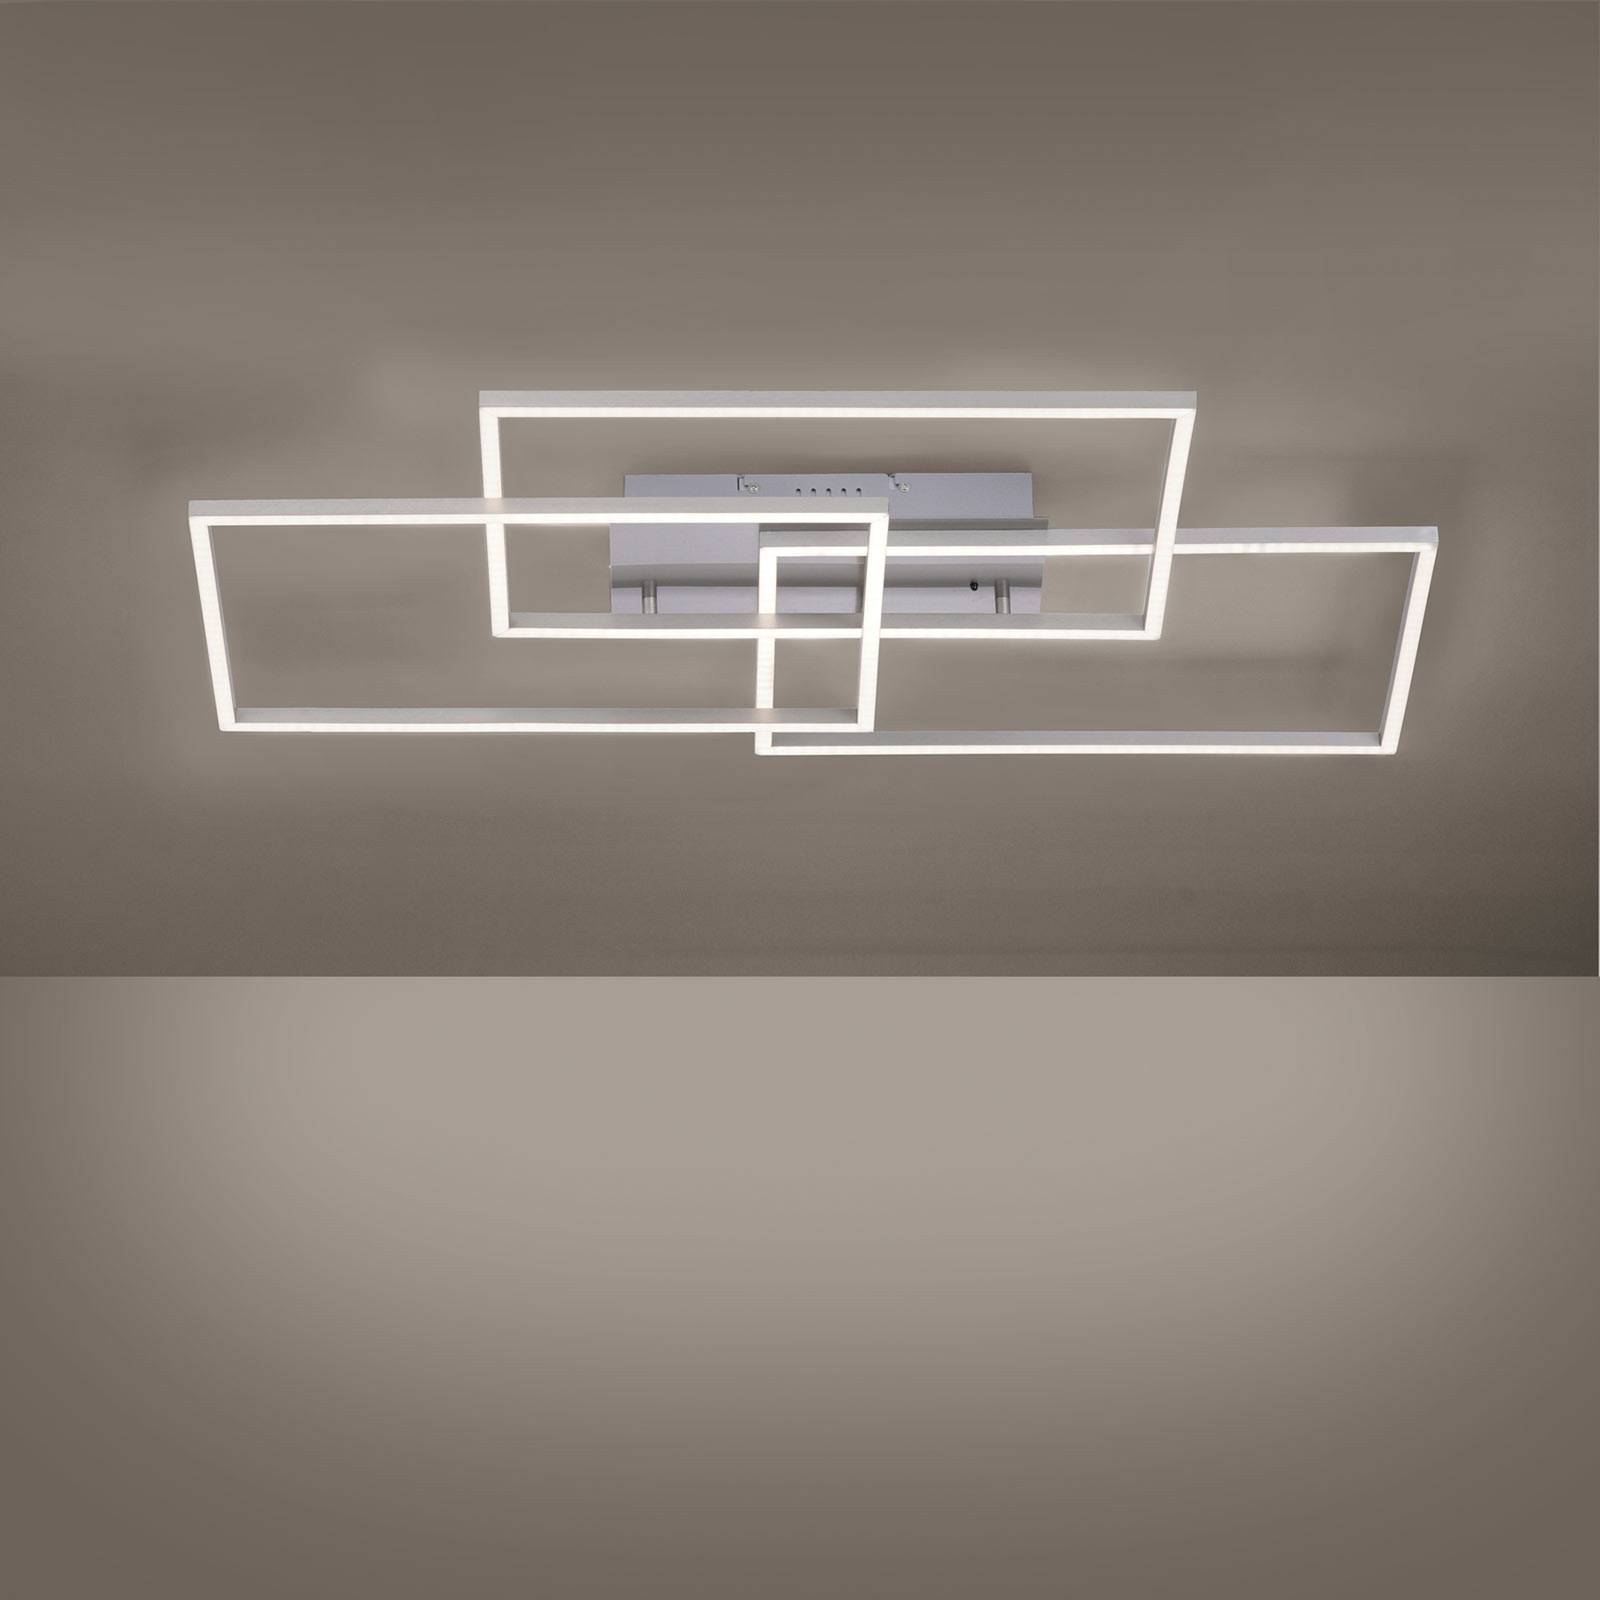 Lampa sufitowa LED Iven, stal, 3-pkt. prostokąt